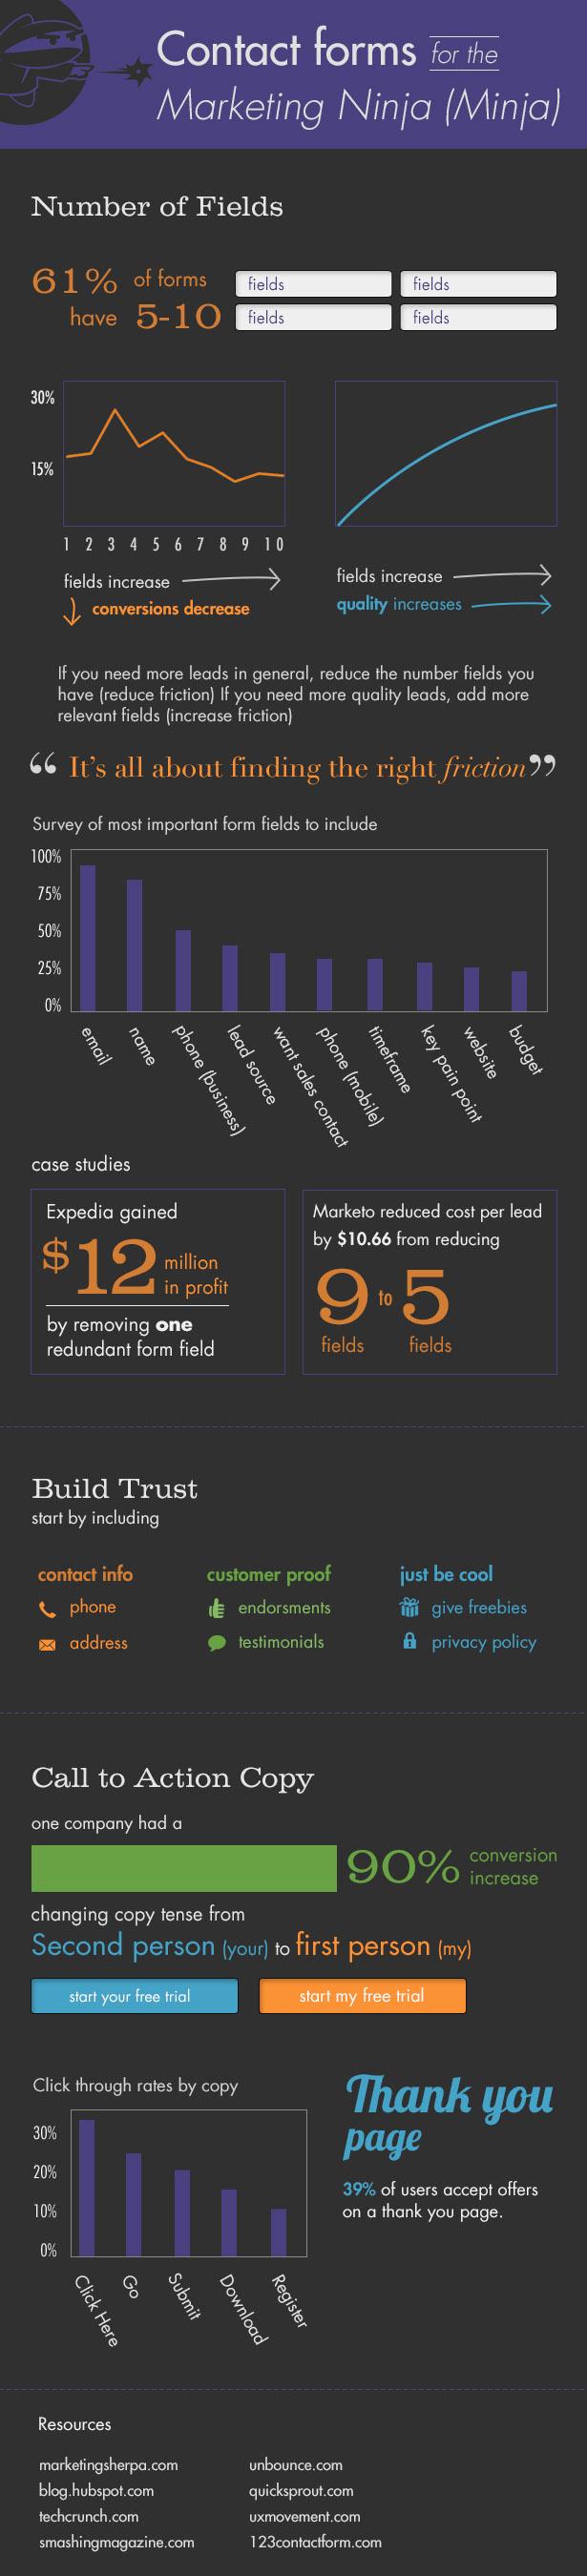 Contactform2 infographic